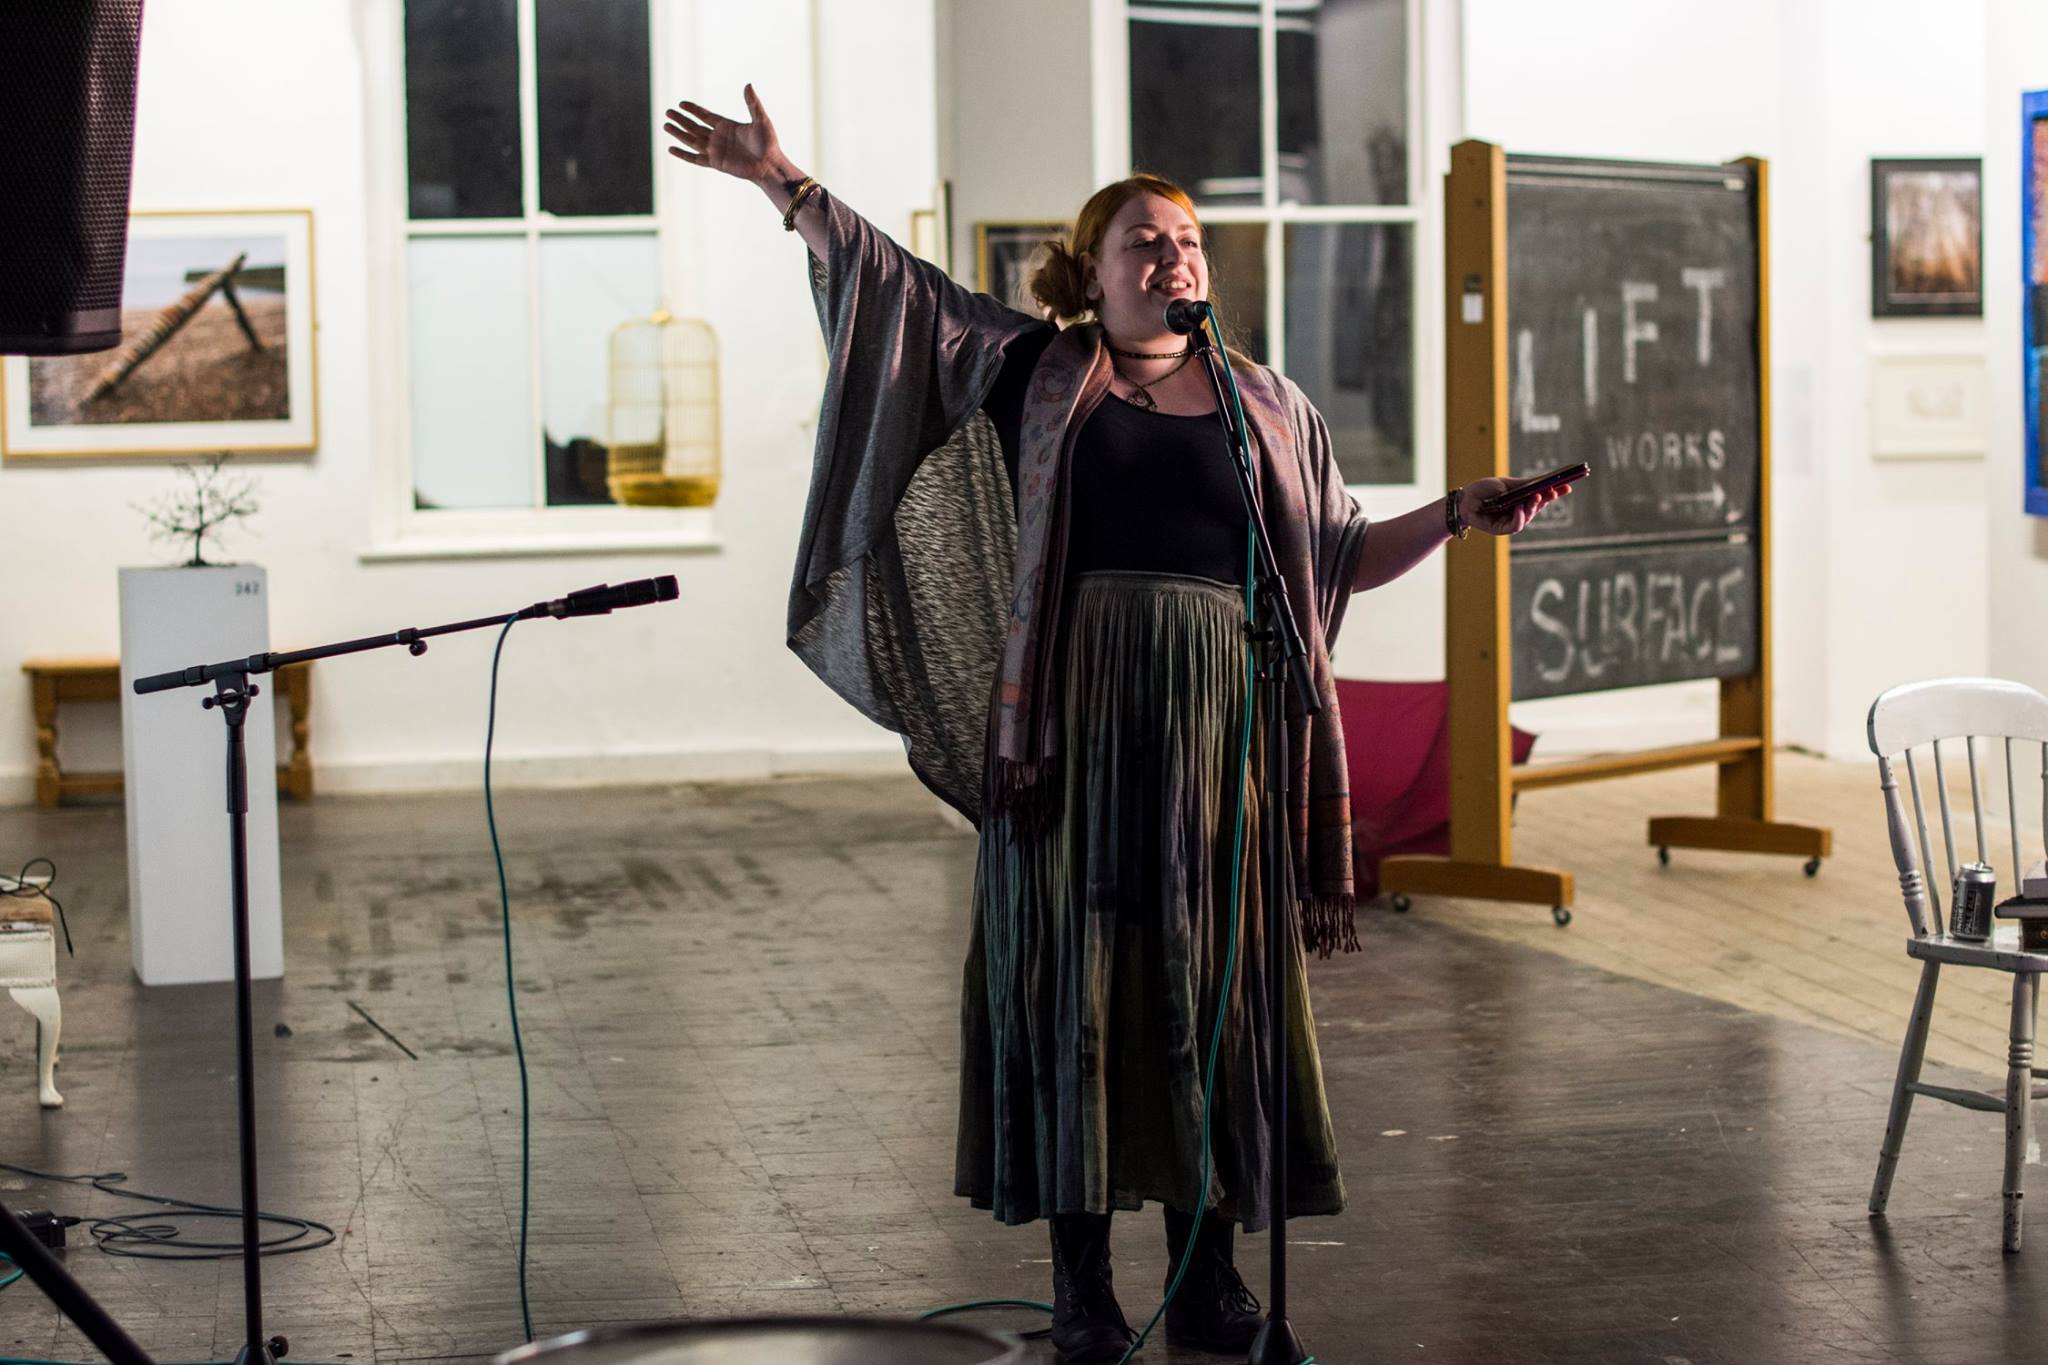 Natasha-Borton-Voicebox-Spoken-Word-_Please-upload-a-lower-res-web-JPEG-photo-for-use-online